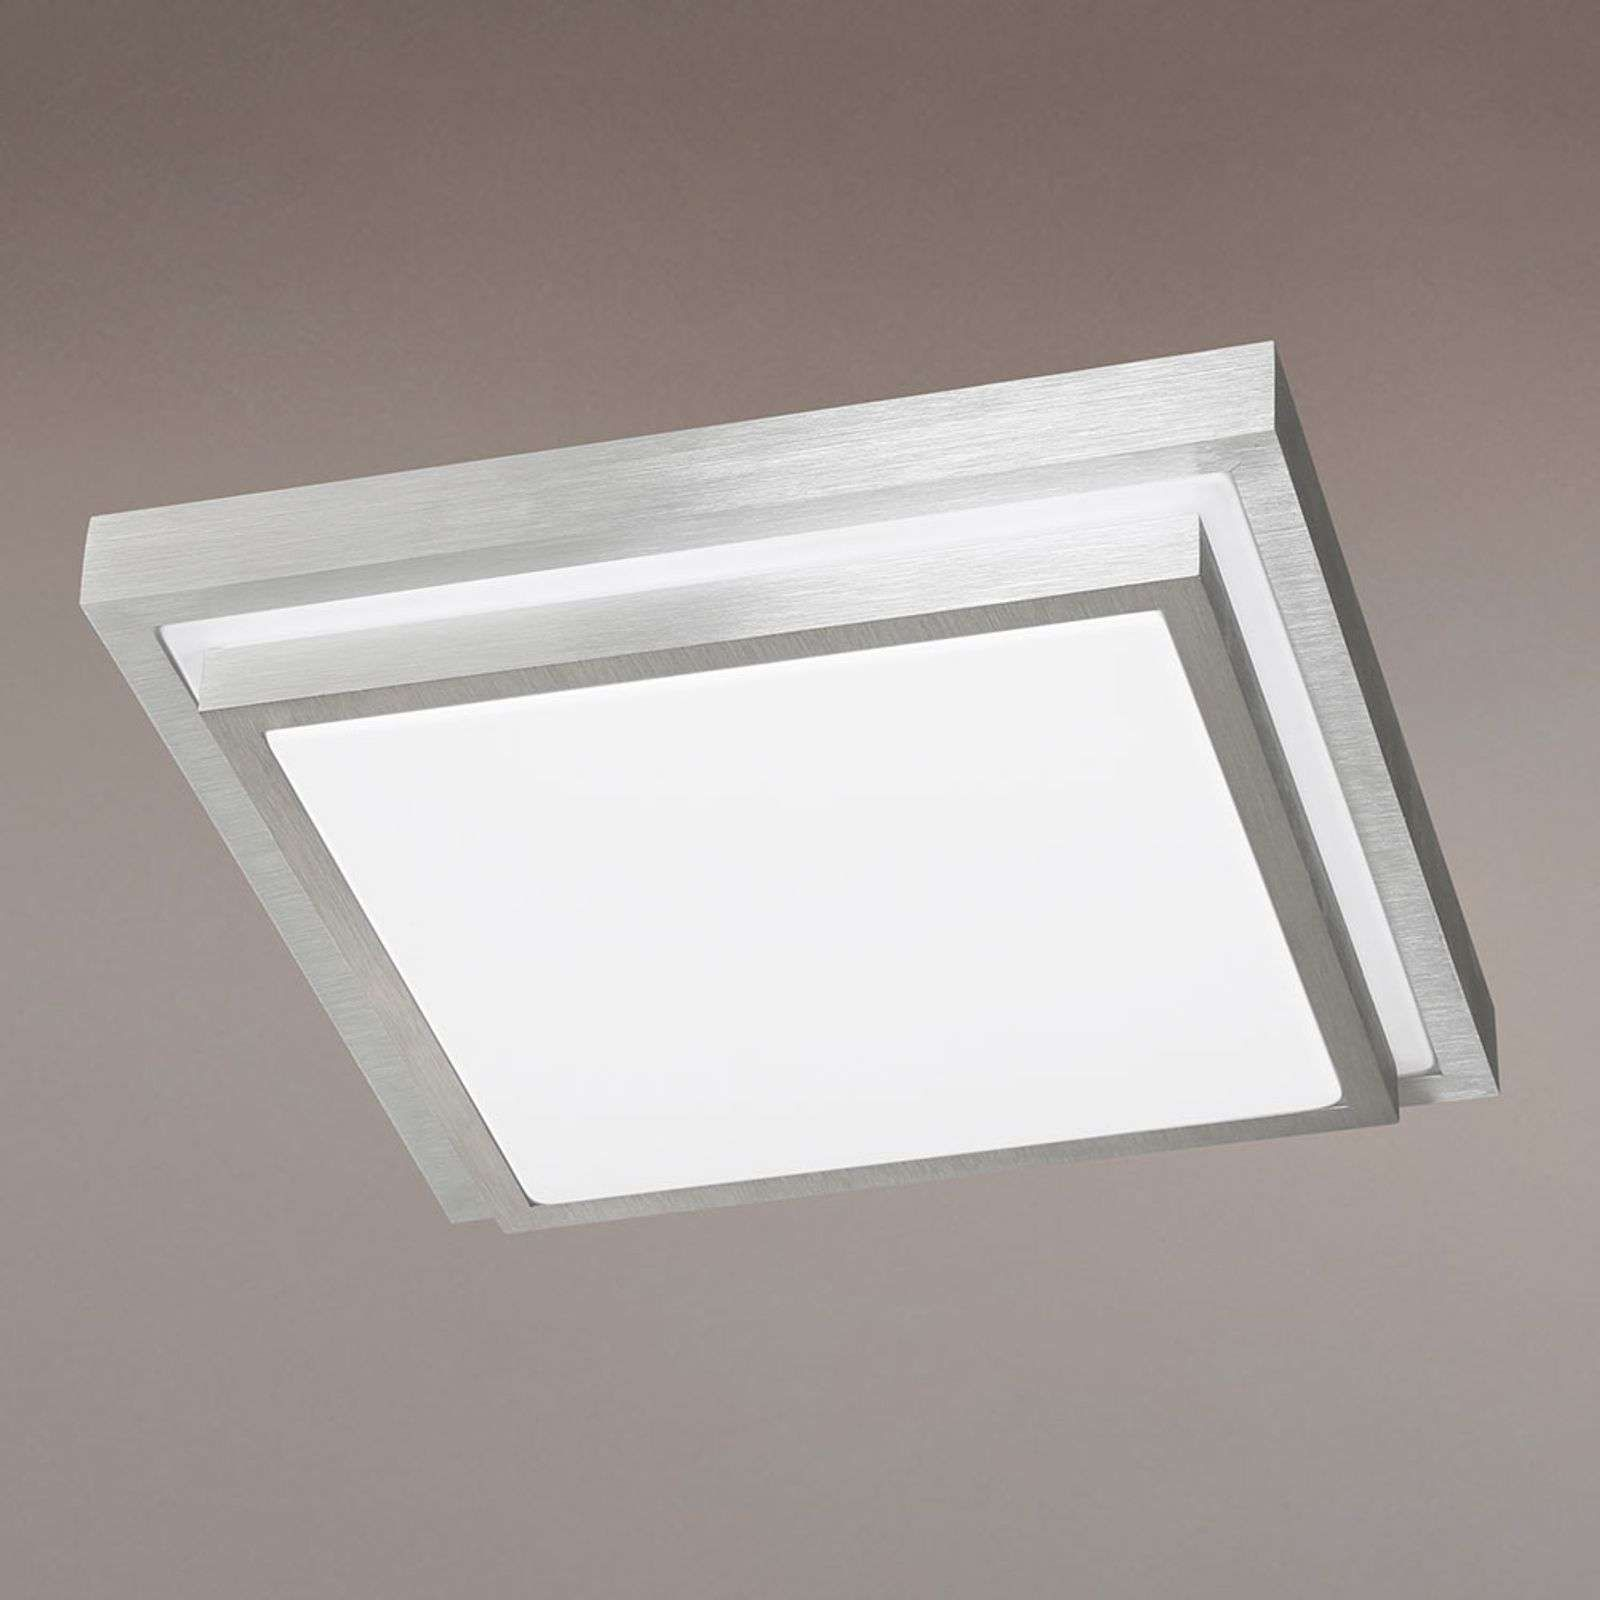 Plafond Lampa Mio Plafondverlichting Design Led Plafondlampen Karwei Led Plafondverlichting Led Lamp Plafond Plafondlamp Plafondverlichting Led